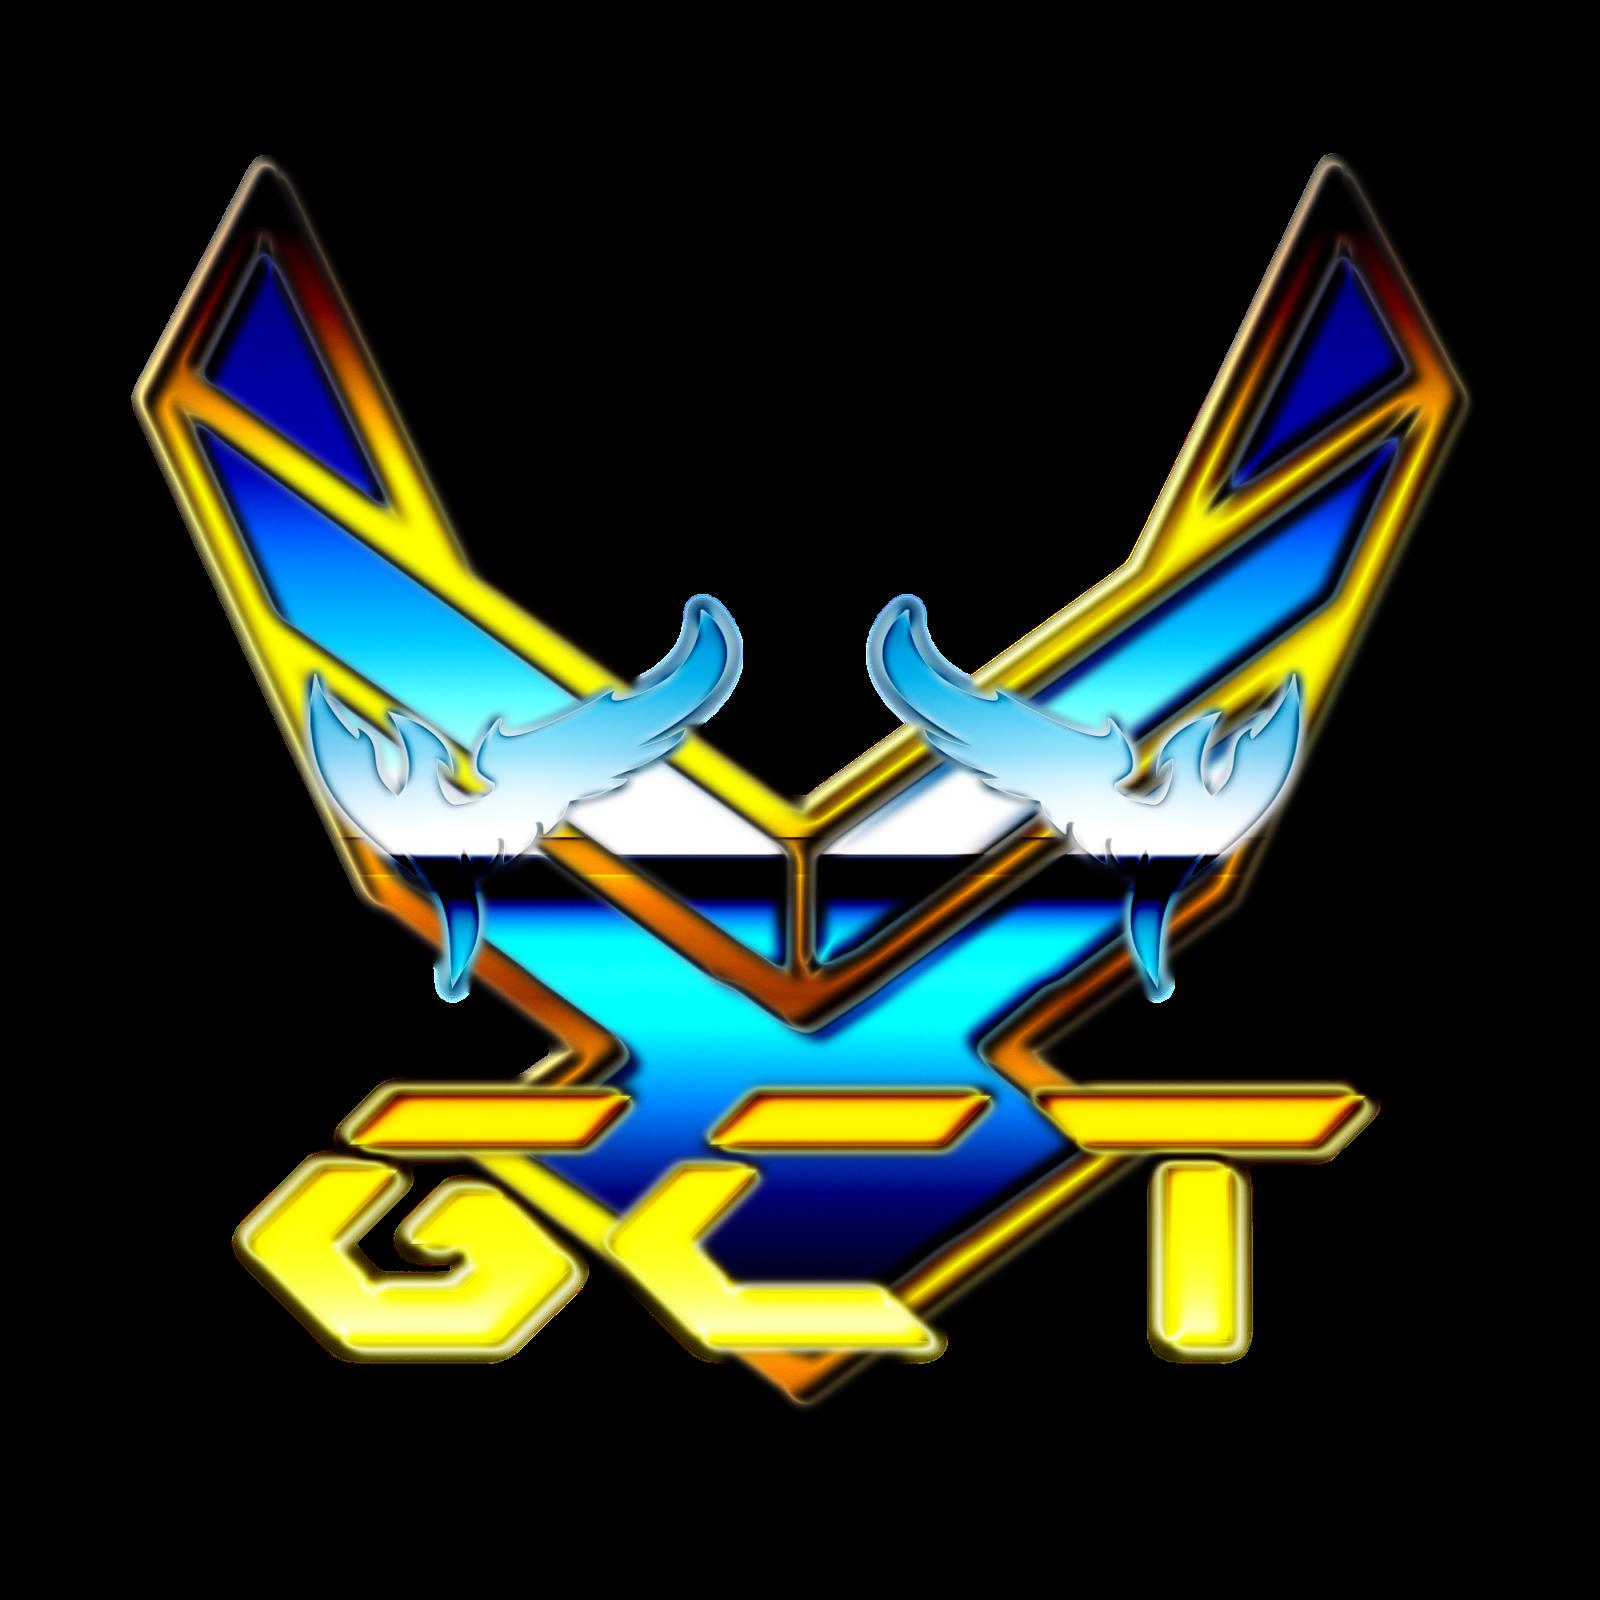 www.gct.clans.cc